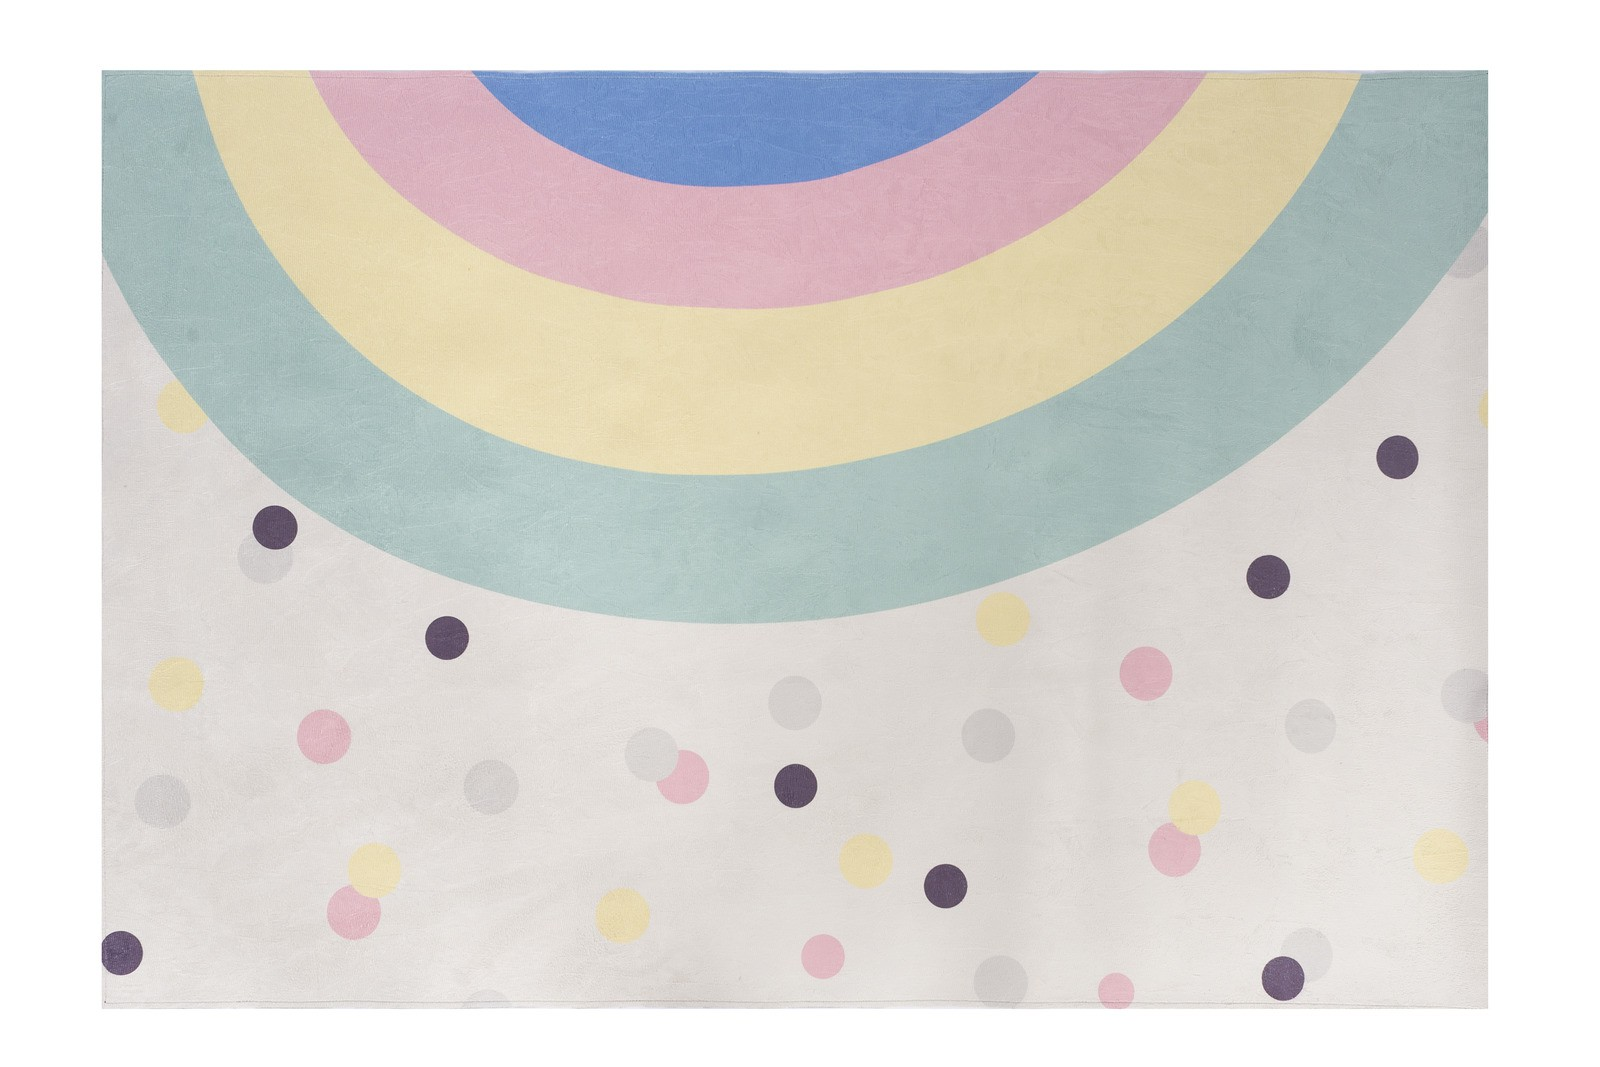 Tapete quarto infantil 100 x 150 cm estampa Arco Íris